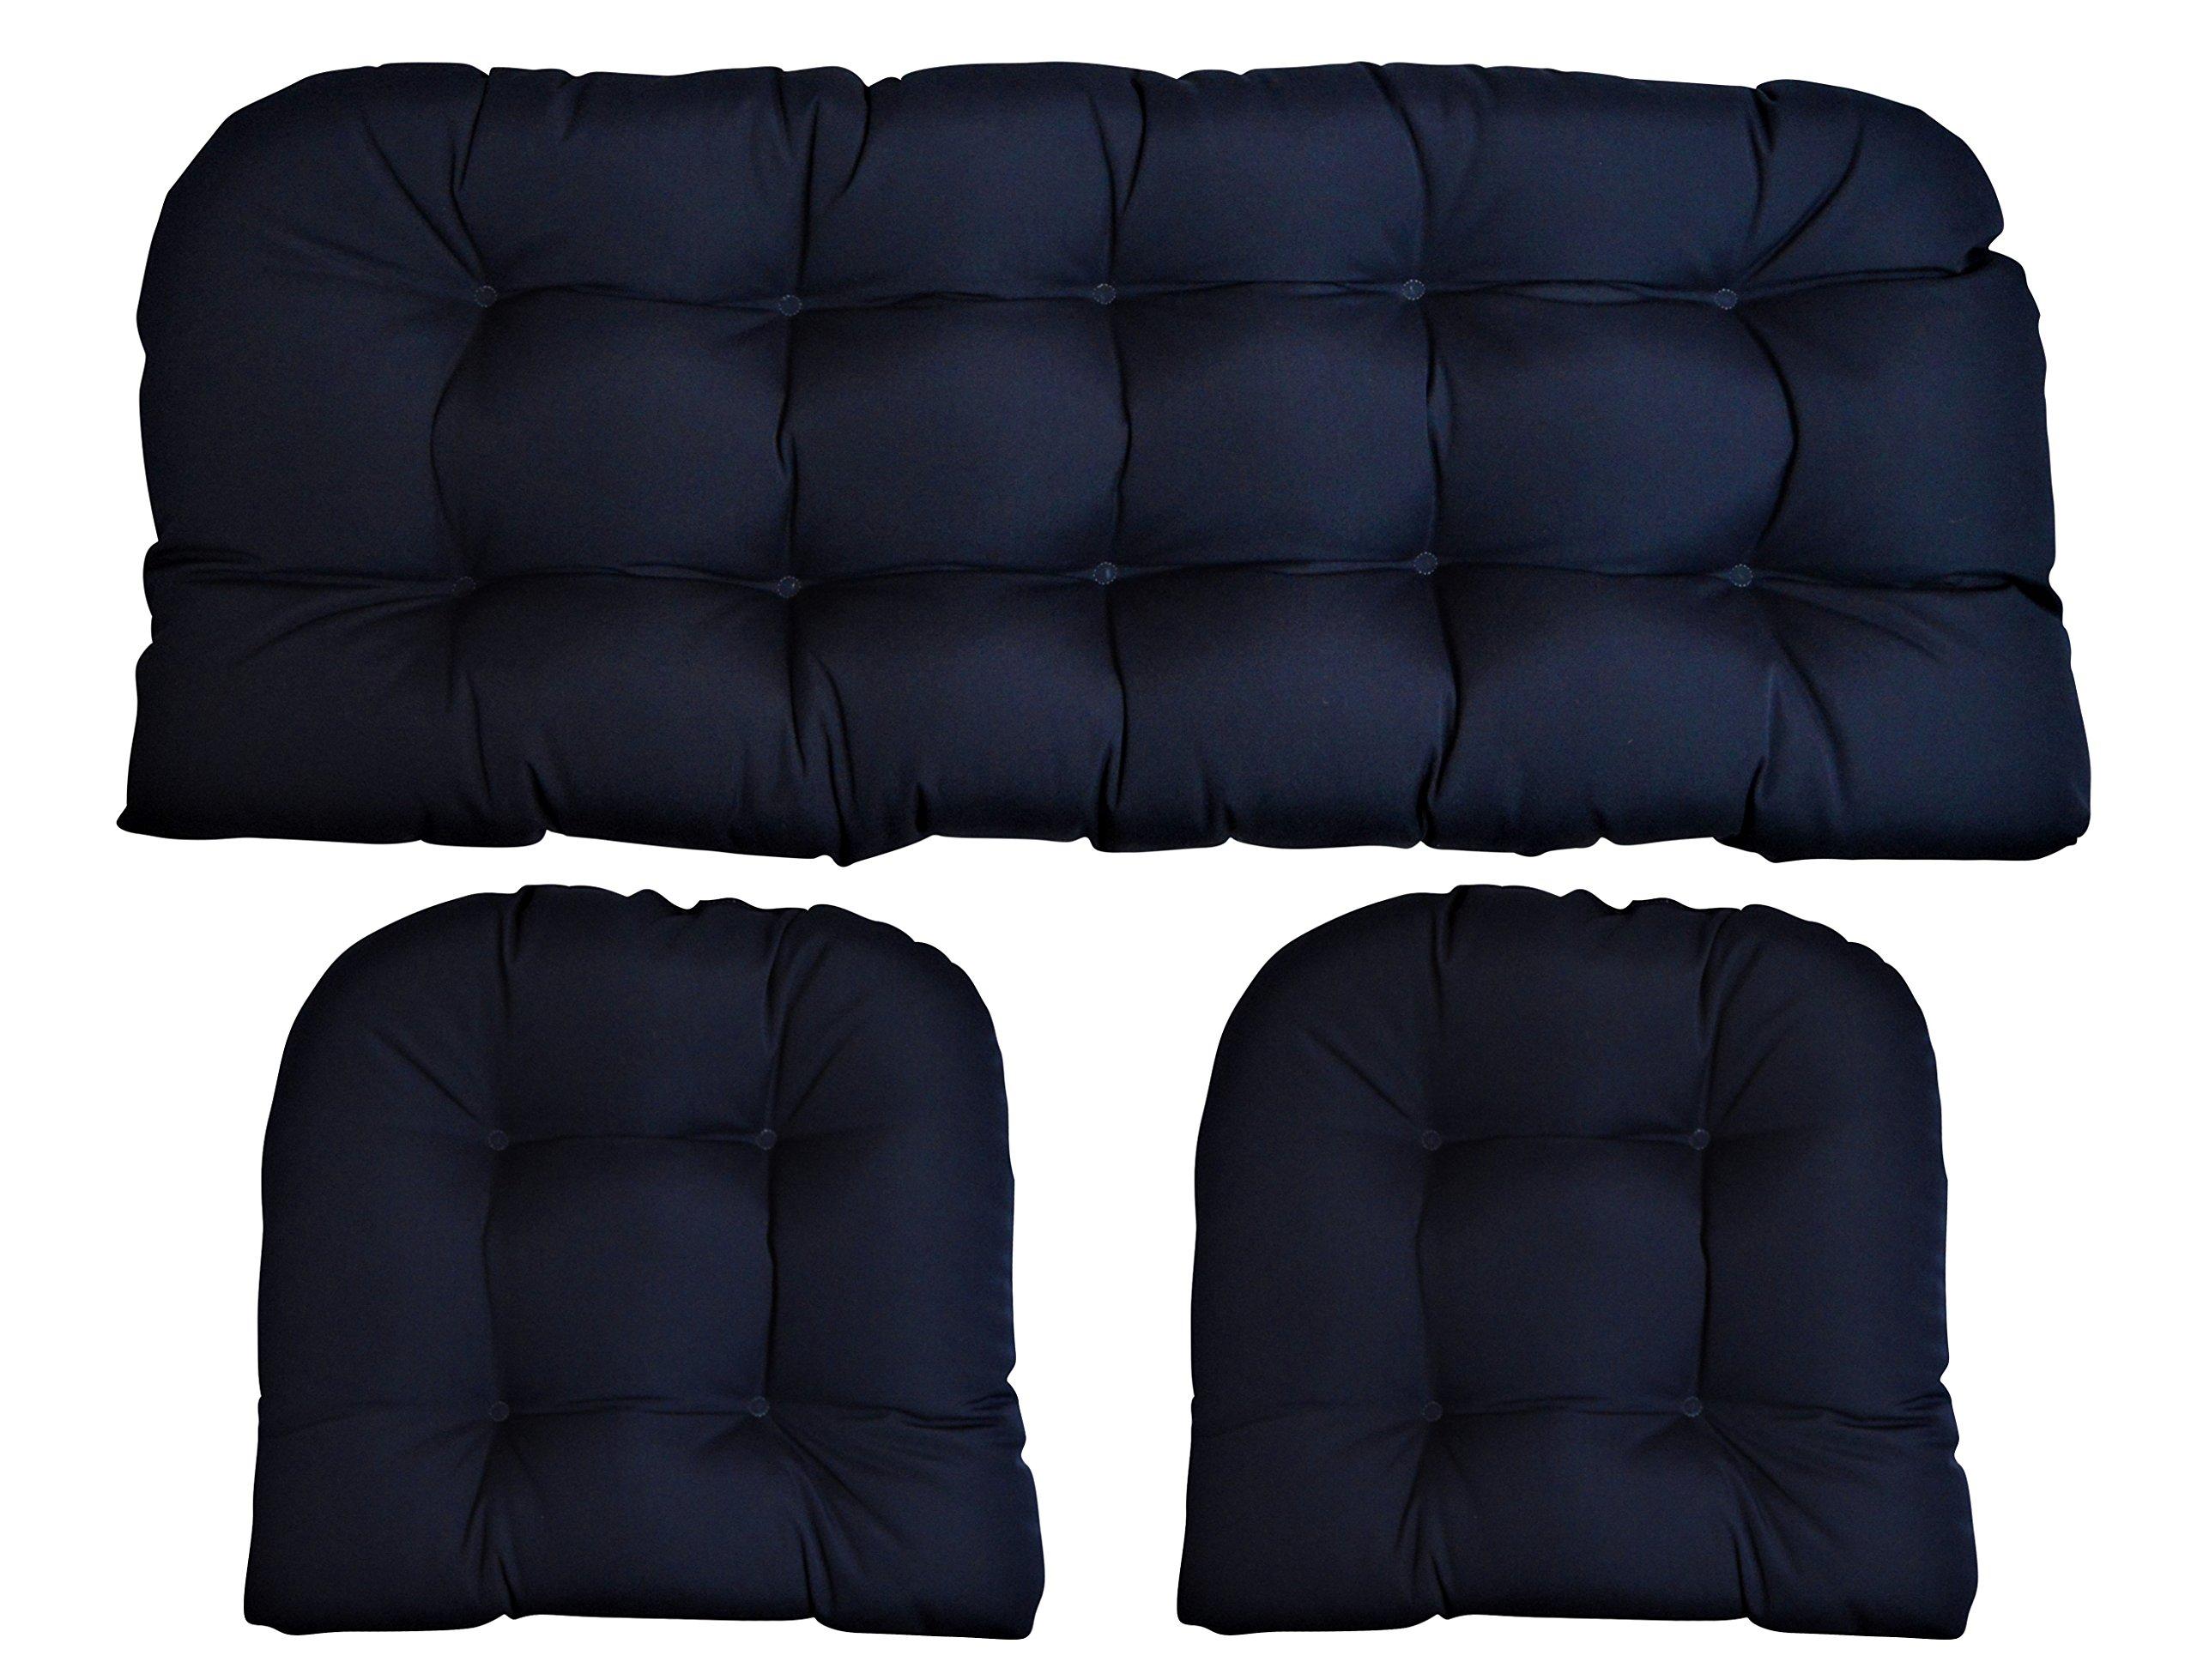 Sunbrella Canvas Navy 3 Piece Wicker Cushion Set - Indoor / Outdoor Wicker Loveseat Settee & 2 Matching Chair Cushions - Blue